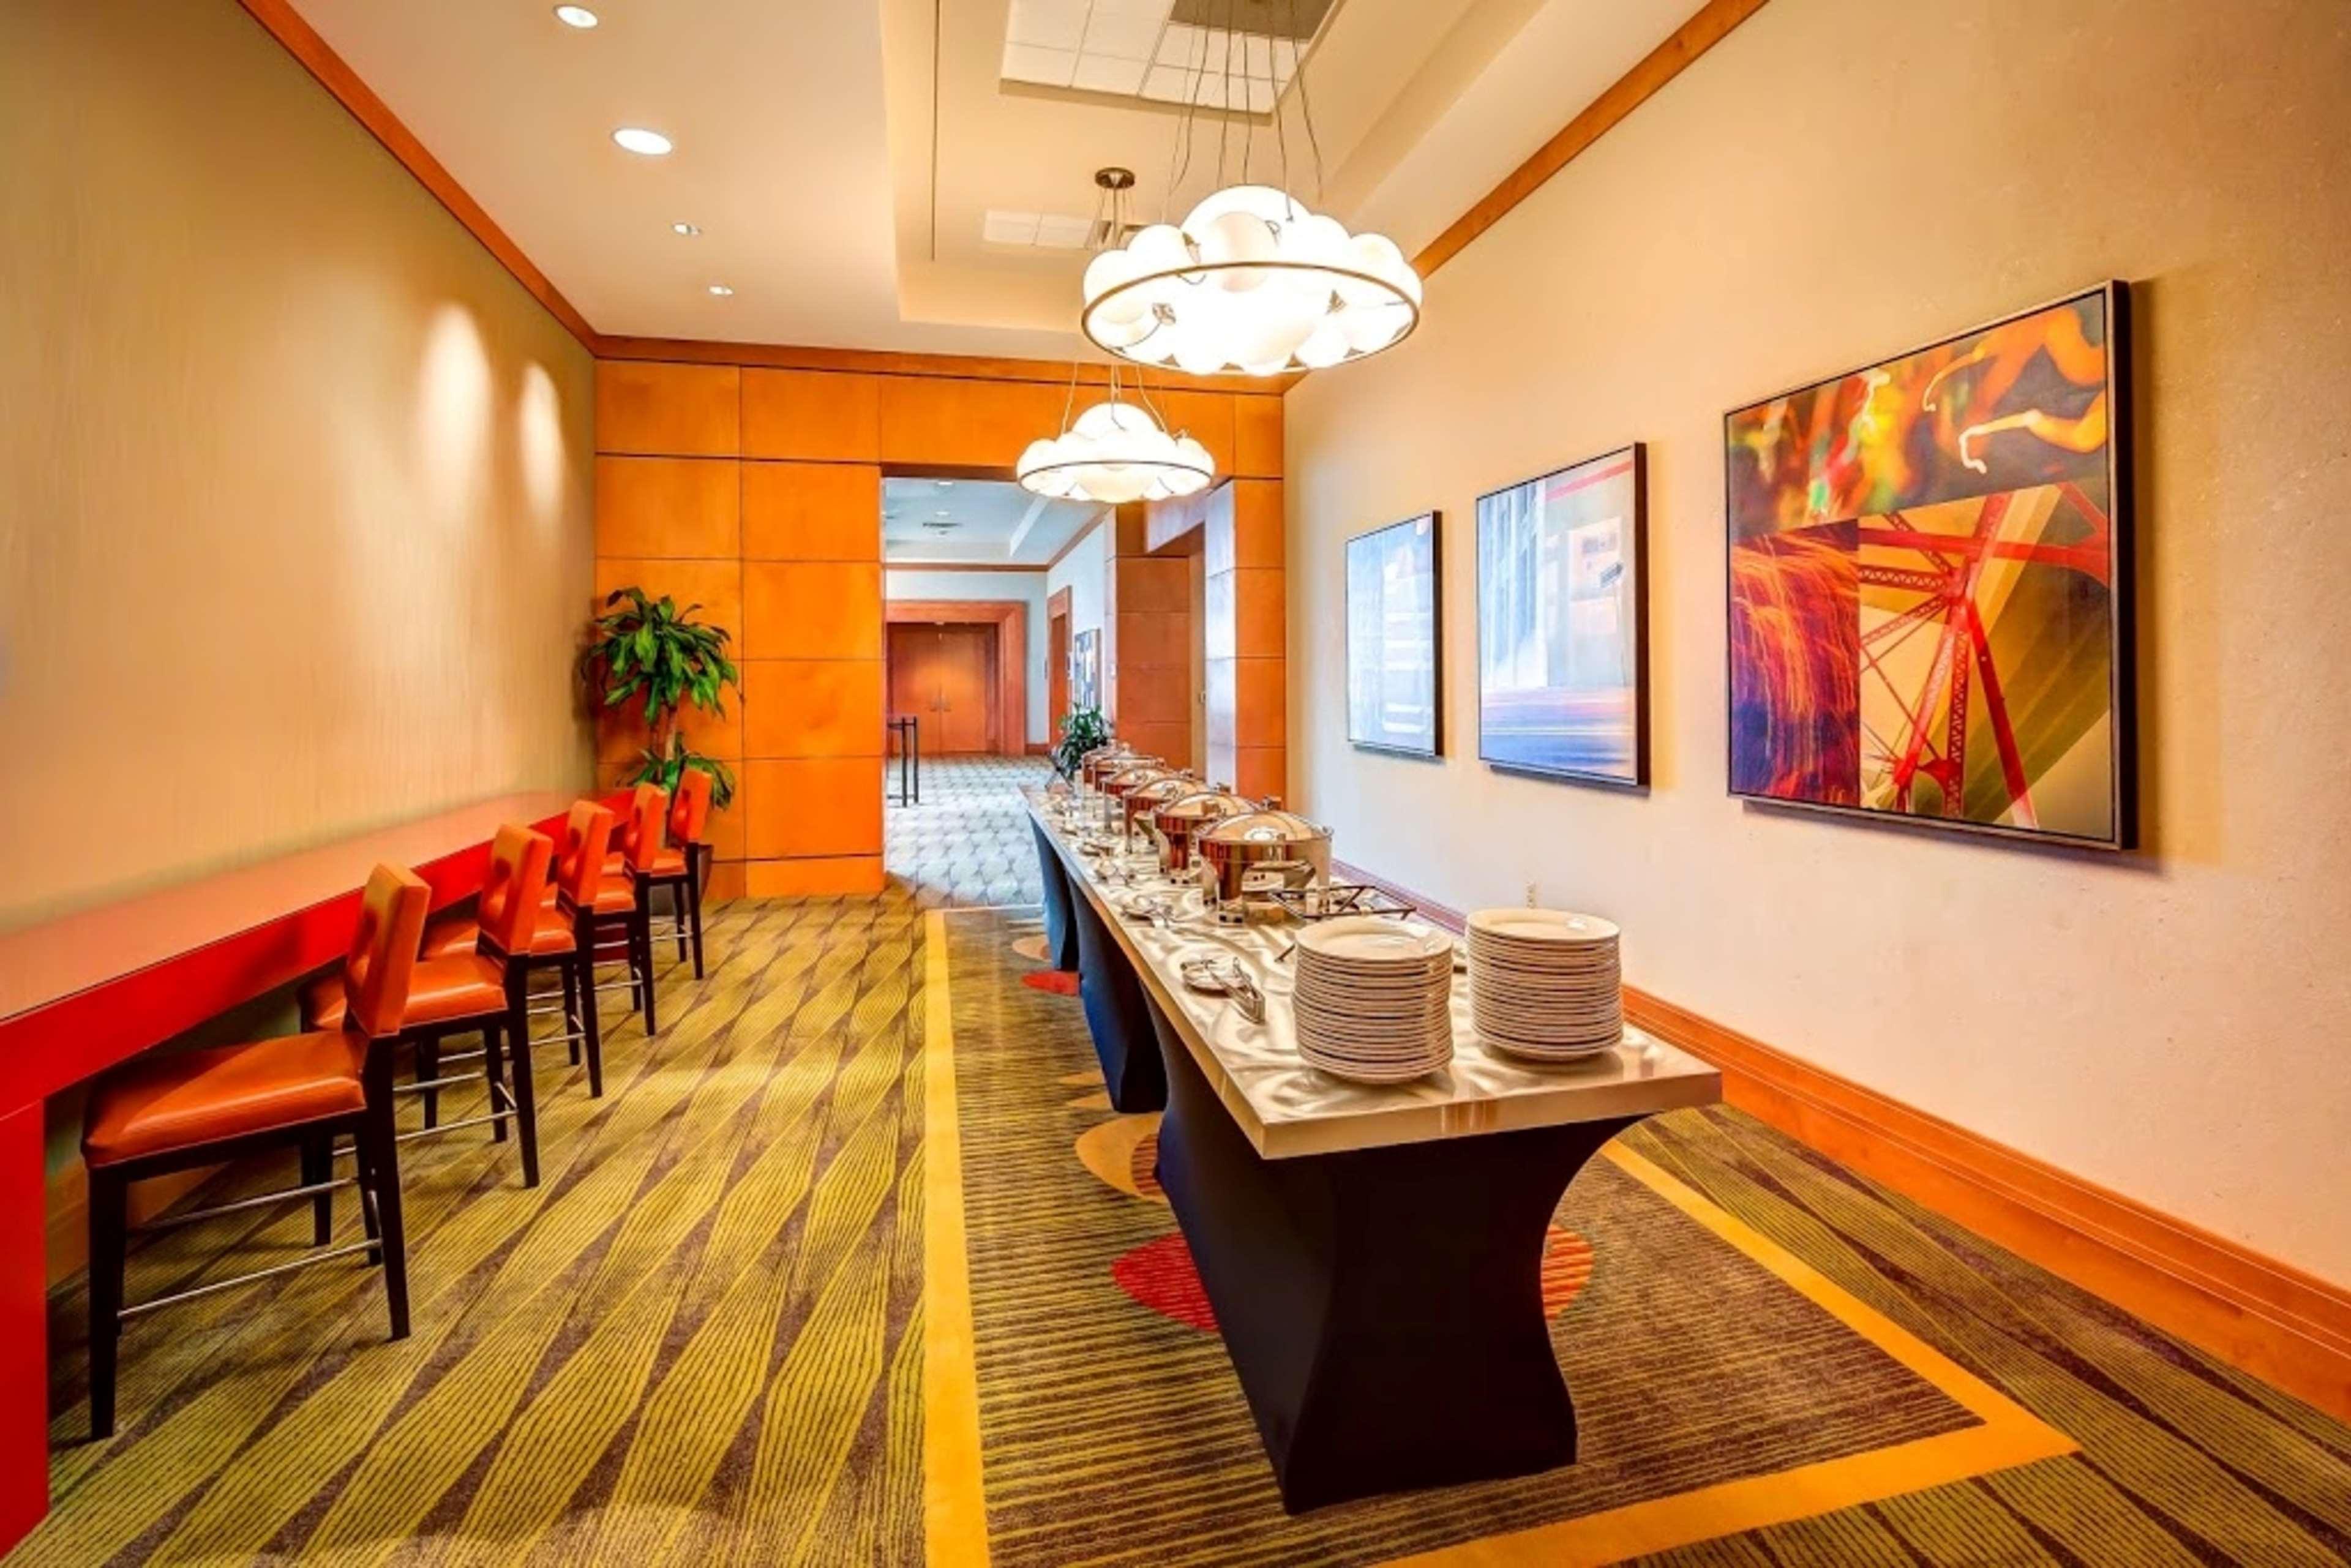 Embassy Suites by Hilton Houston Energy Corridor image 45